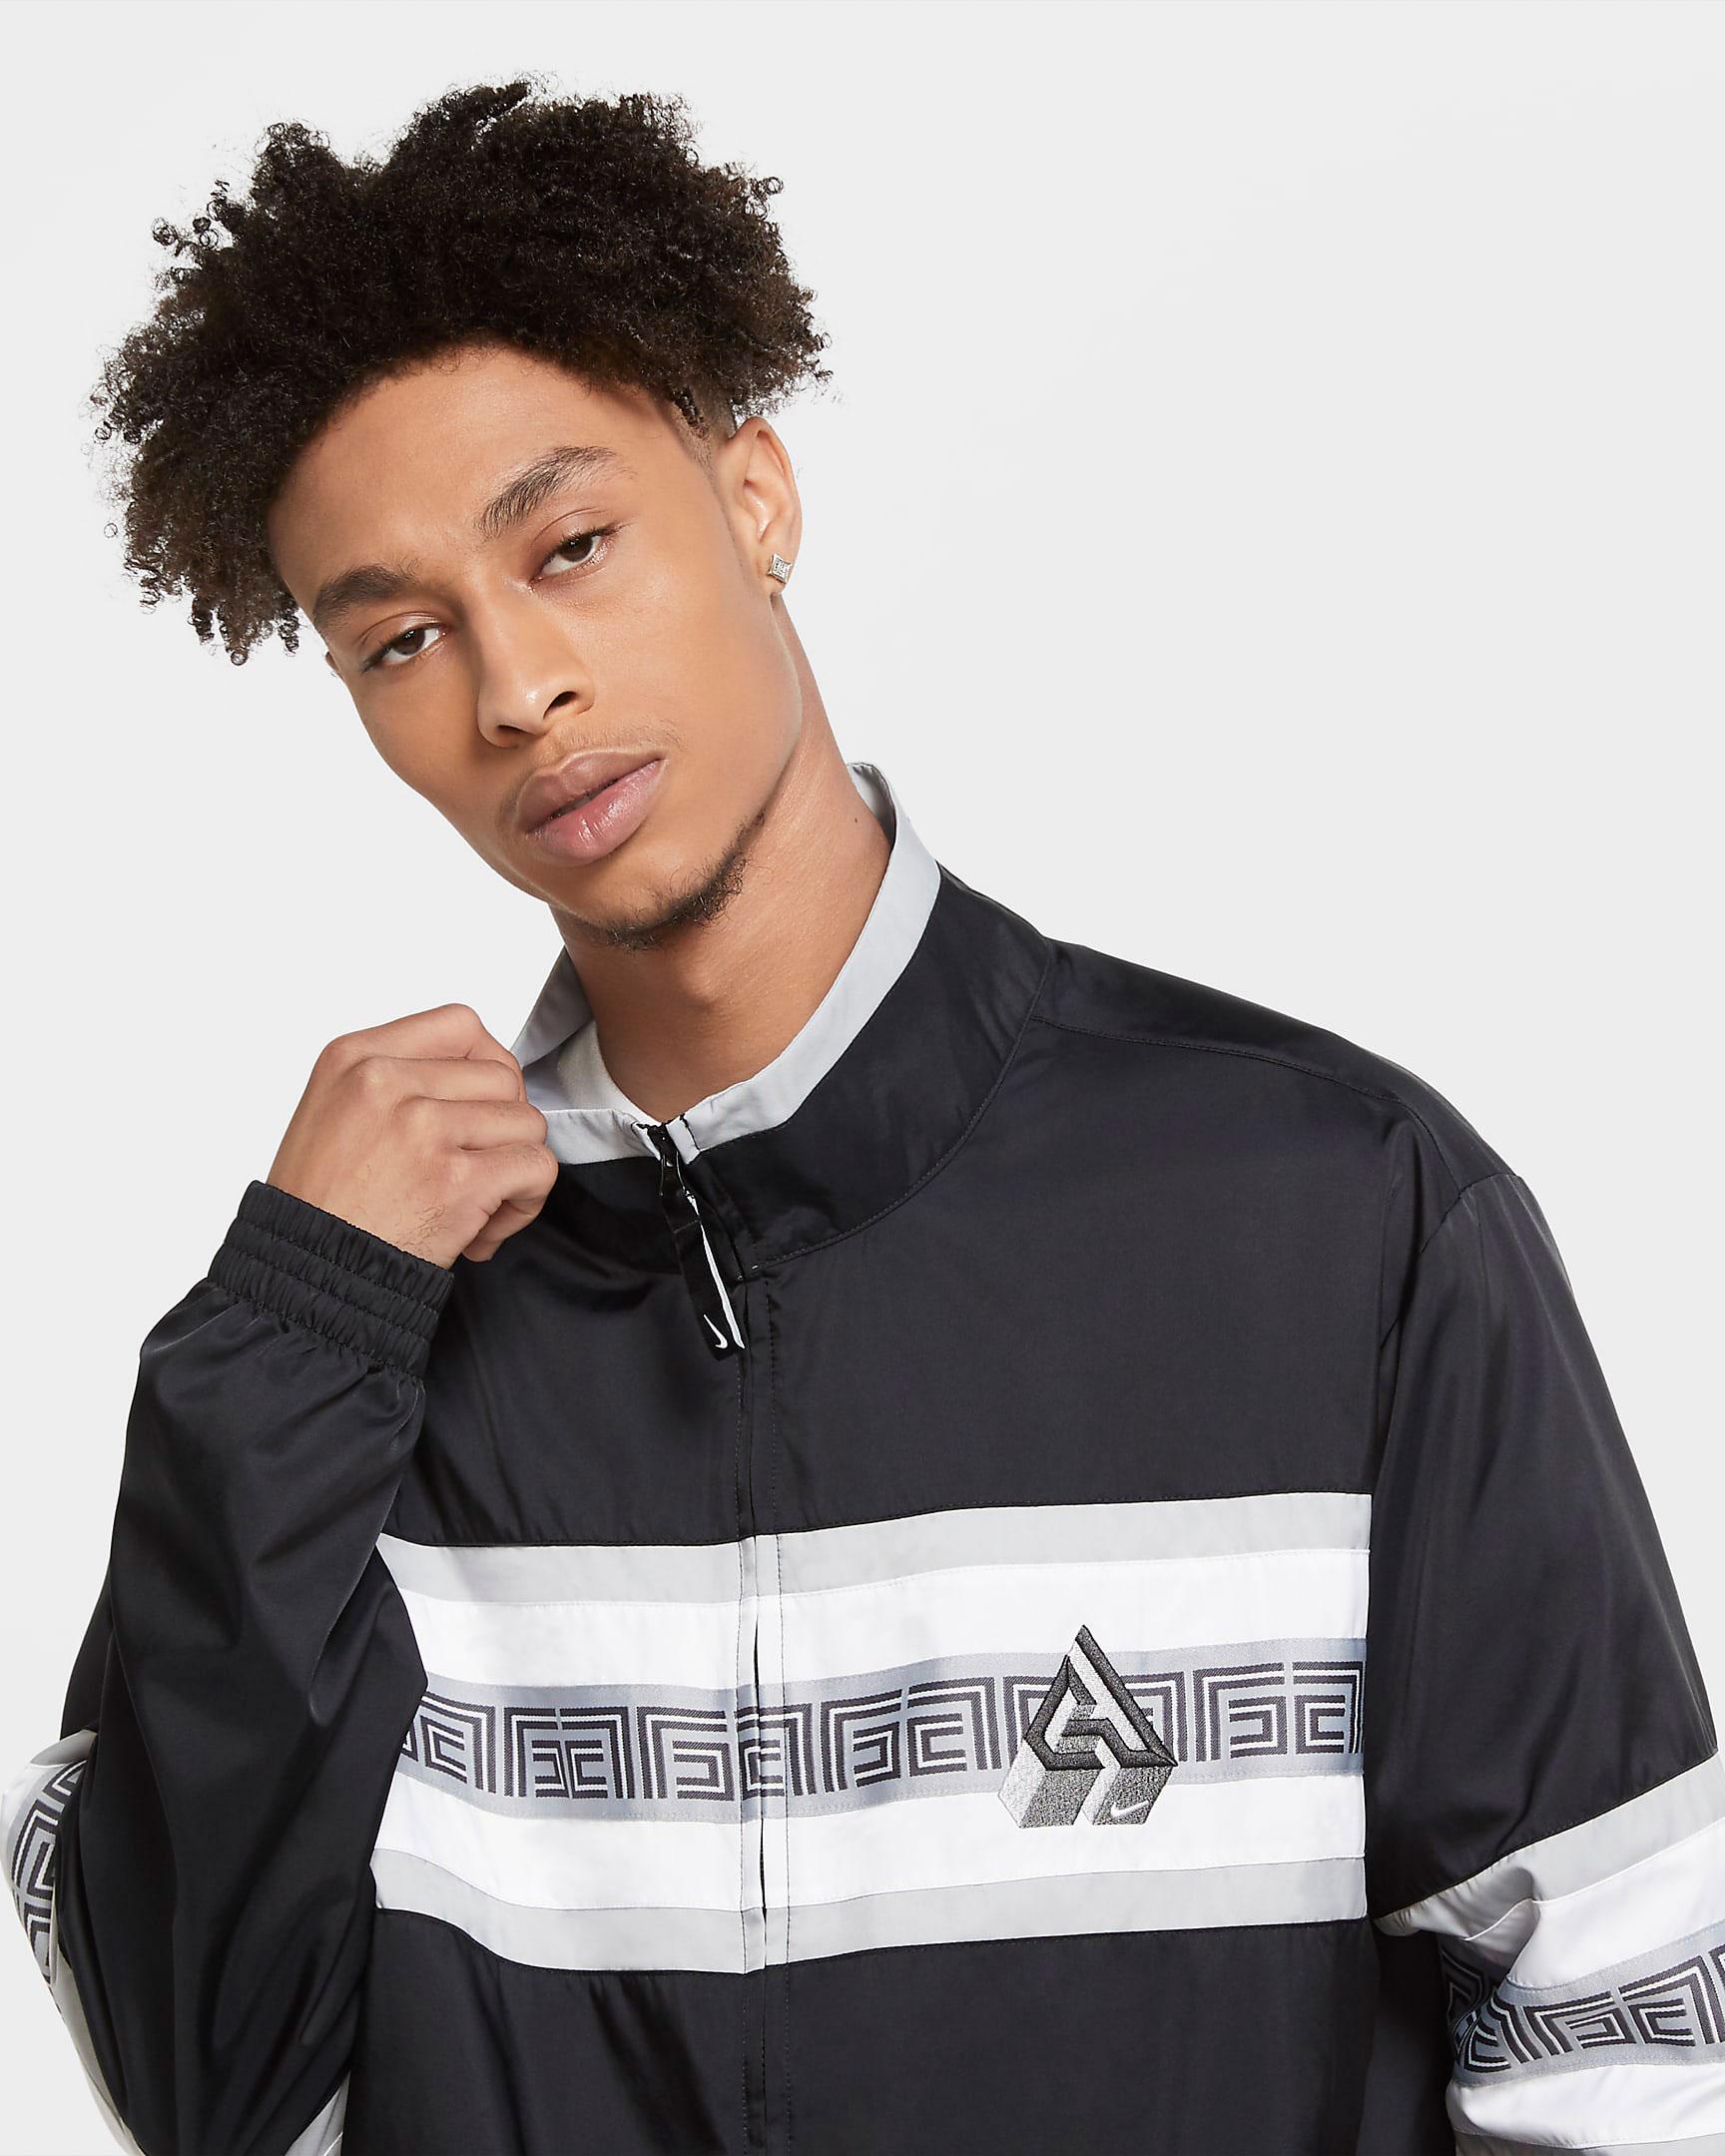 nike-giannis-jacket-black-white-3